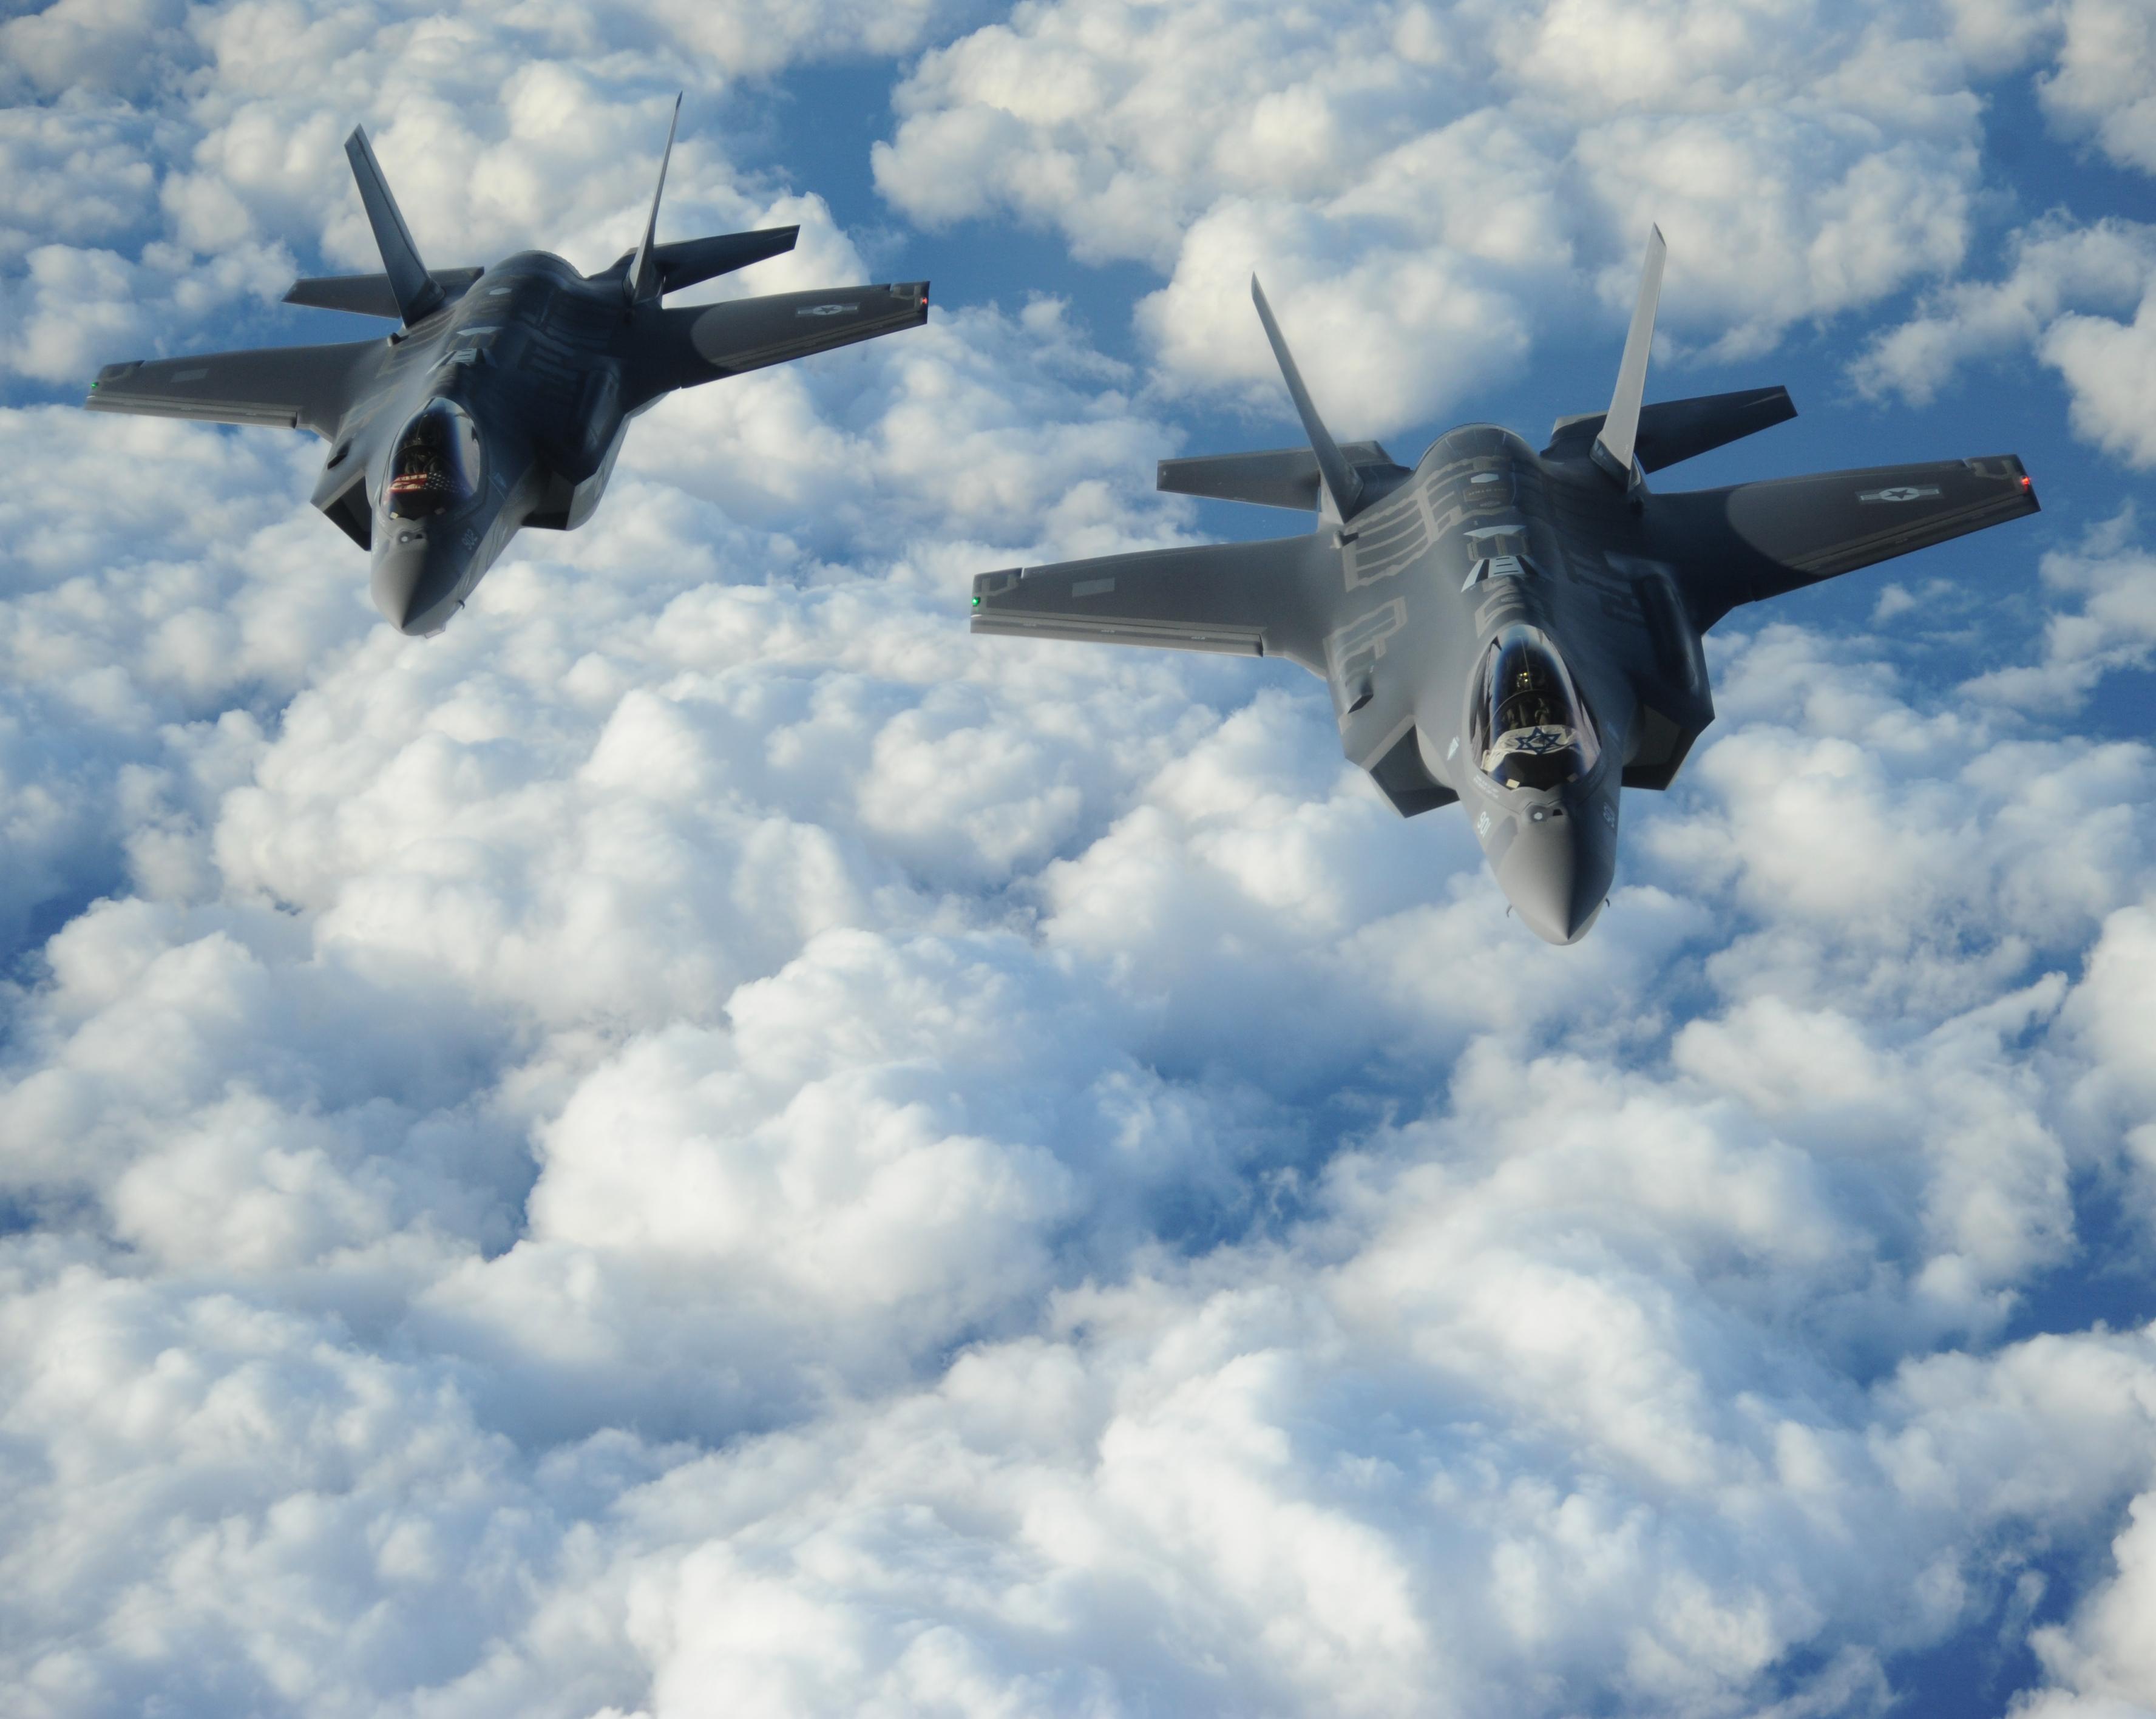 Israeli atrocities in Gaza: 1,300 dead in three weeks ... |Israeli Fighter Jets In Action